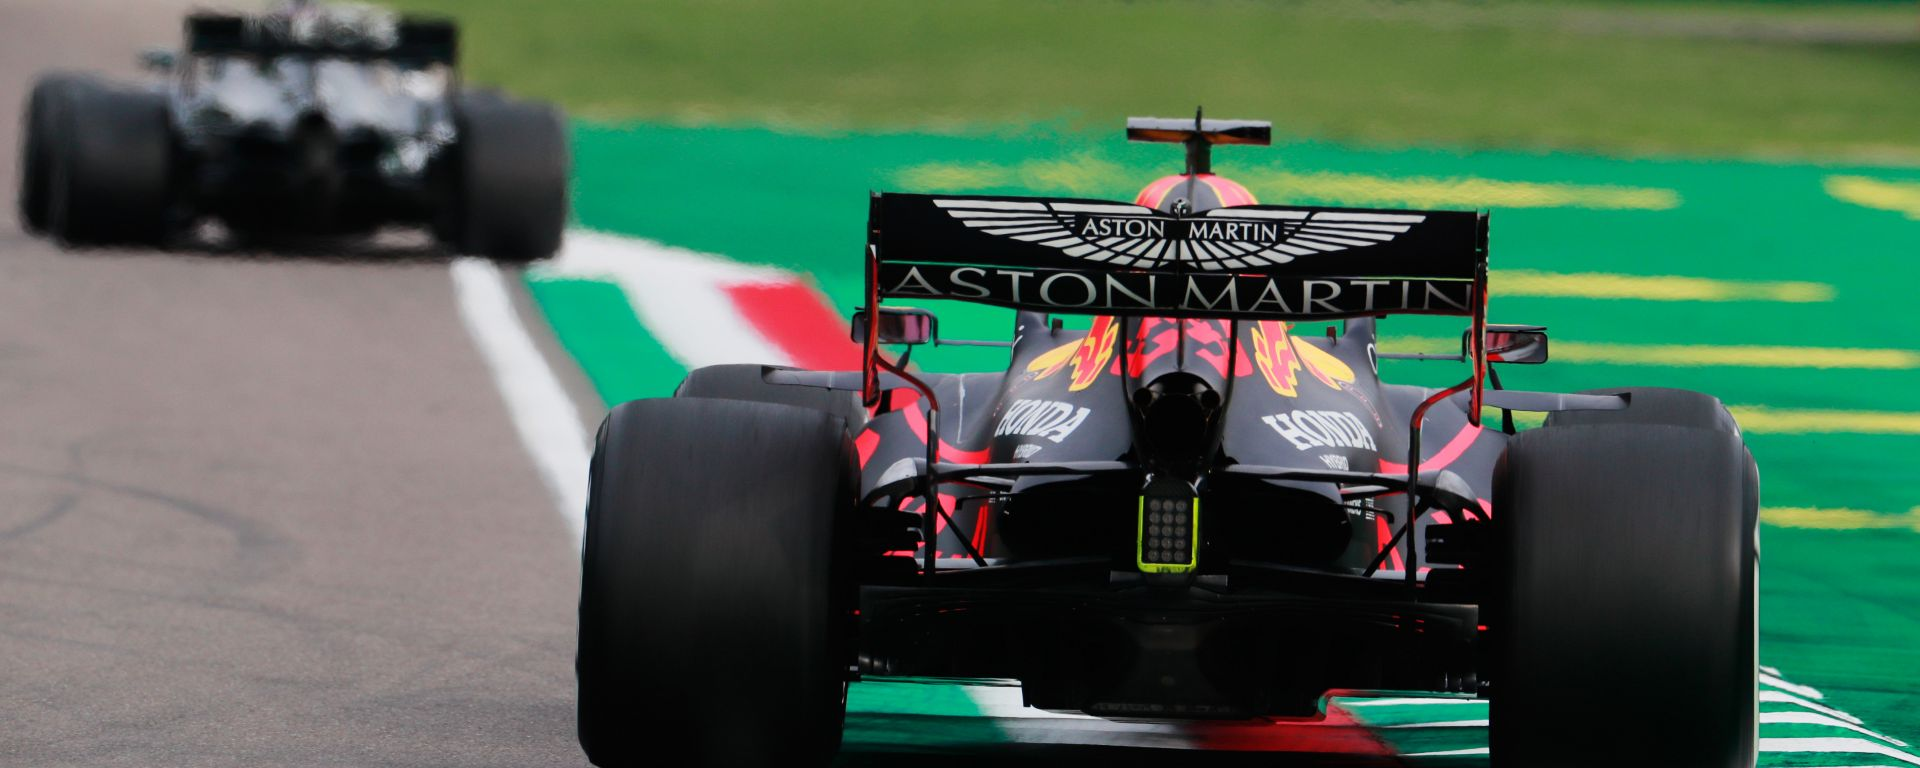 F1, GP Emilia Romagna: Max Verstappen (Red Bull) insegue una Mercedes